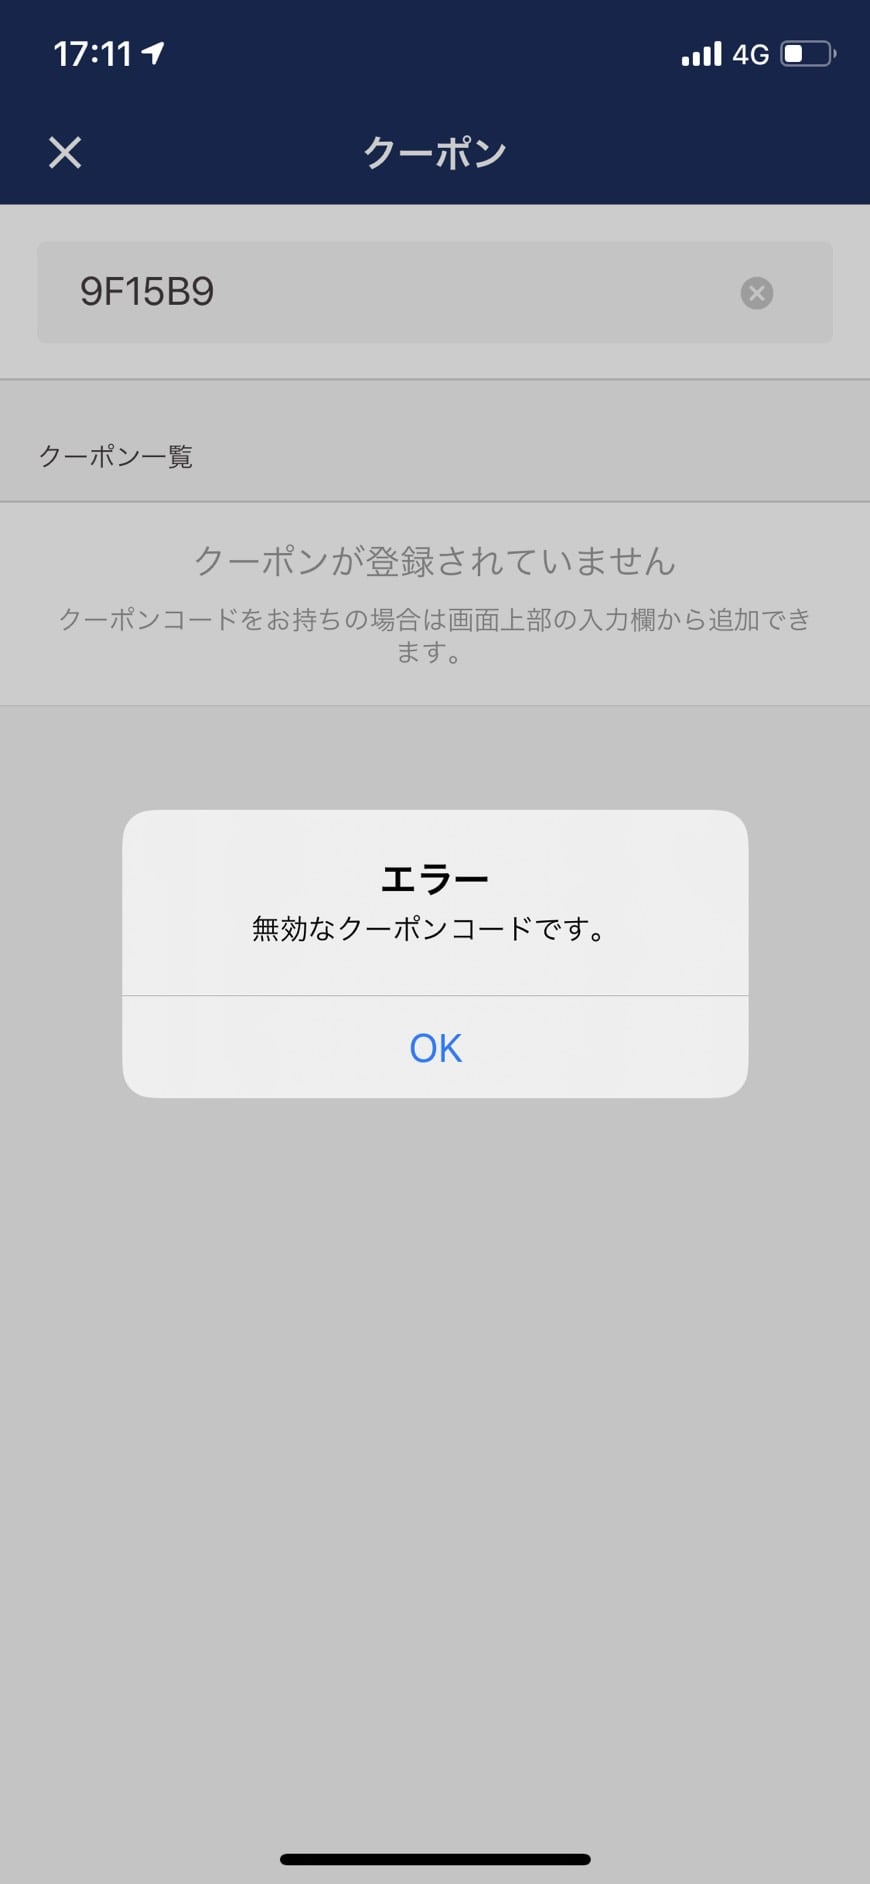 JapanTaxiの無効なクーポンコードです表示